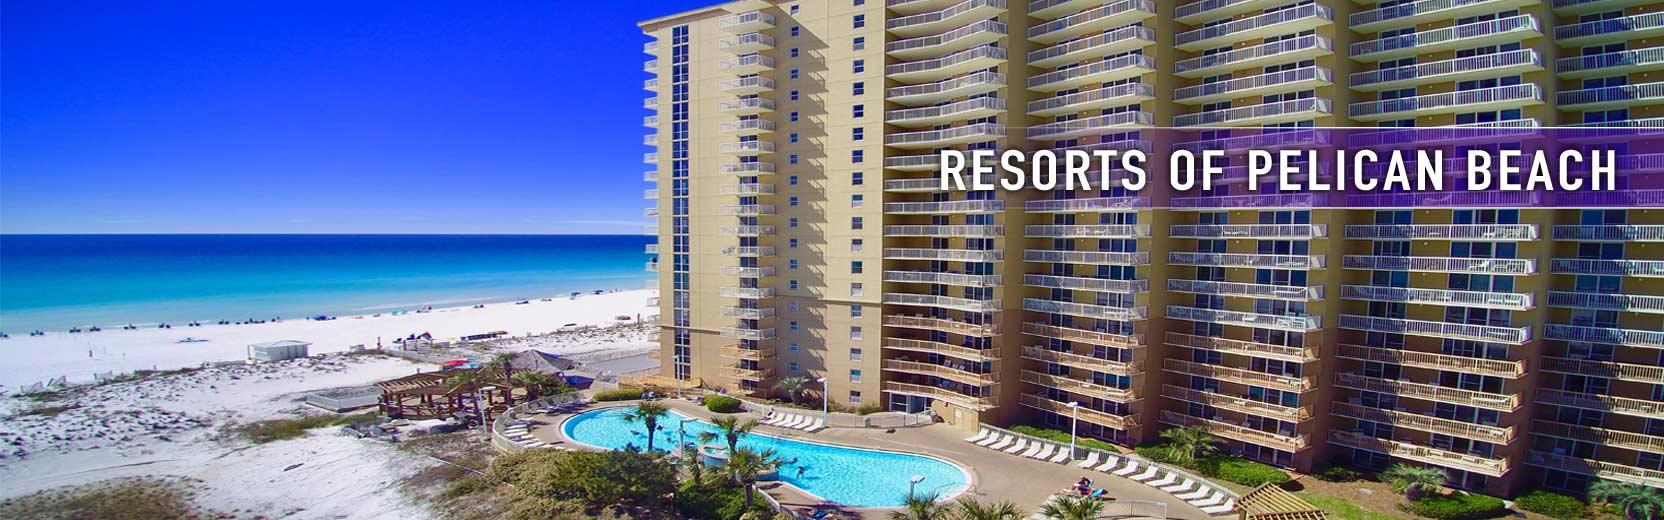 Resorts Of Pelican Beach Destin